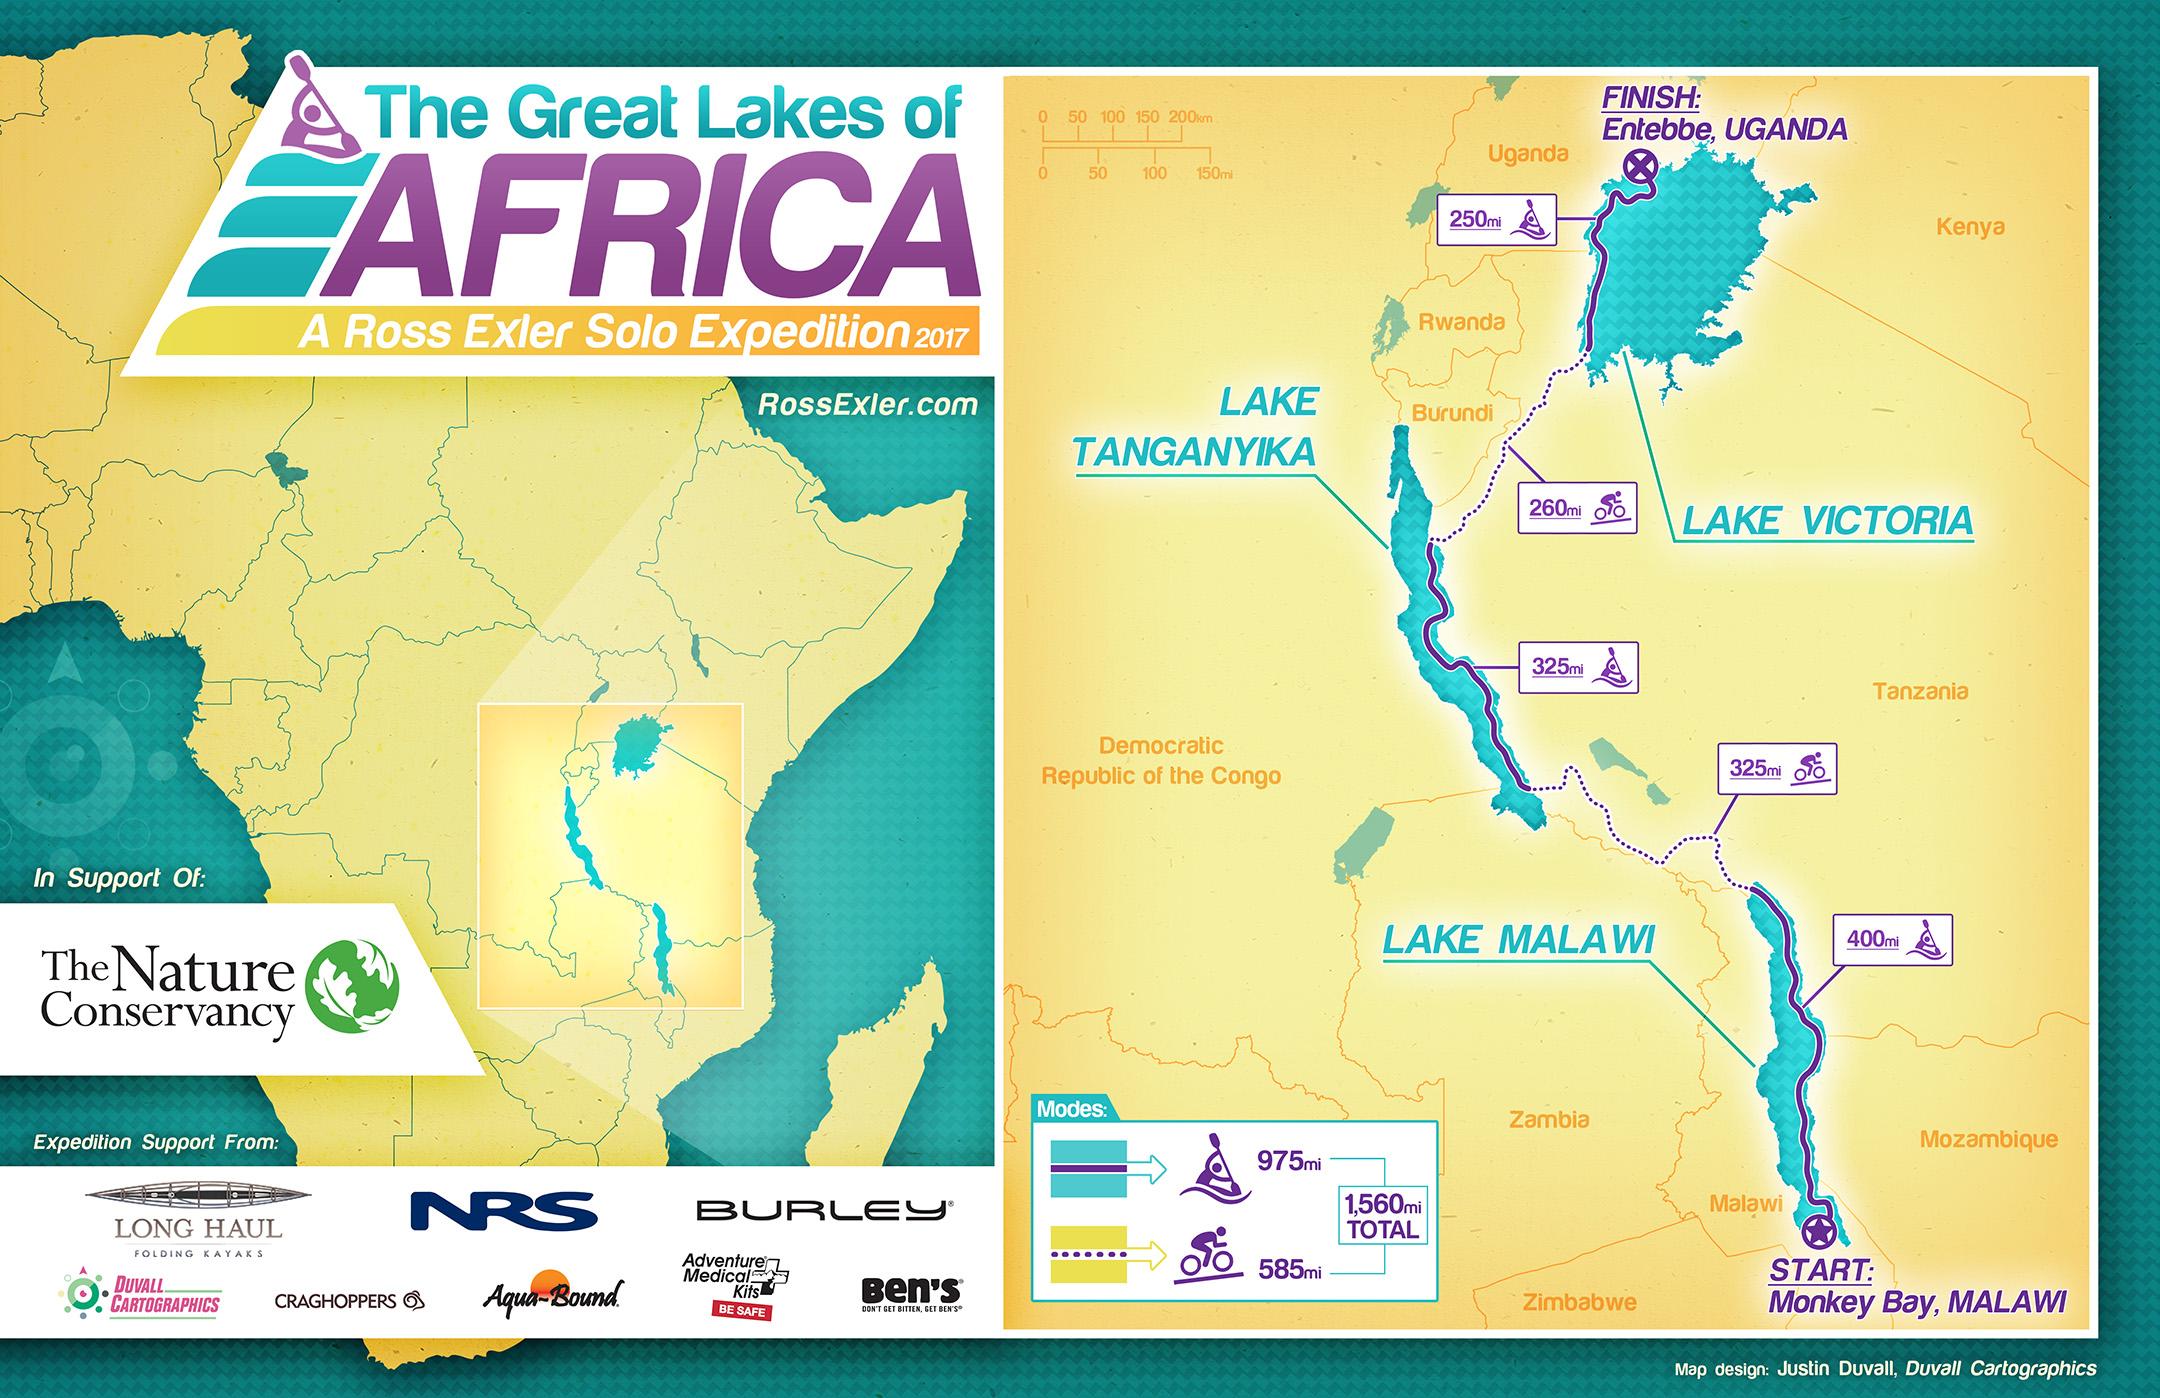 AfricaGreatLakes_cartographic_7_proof.jpg